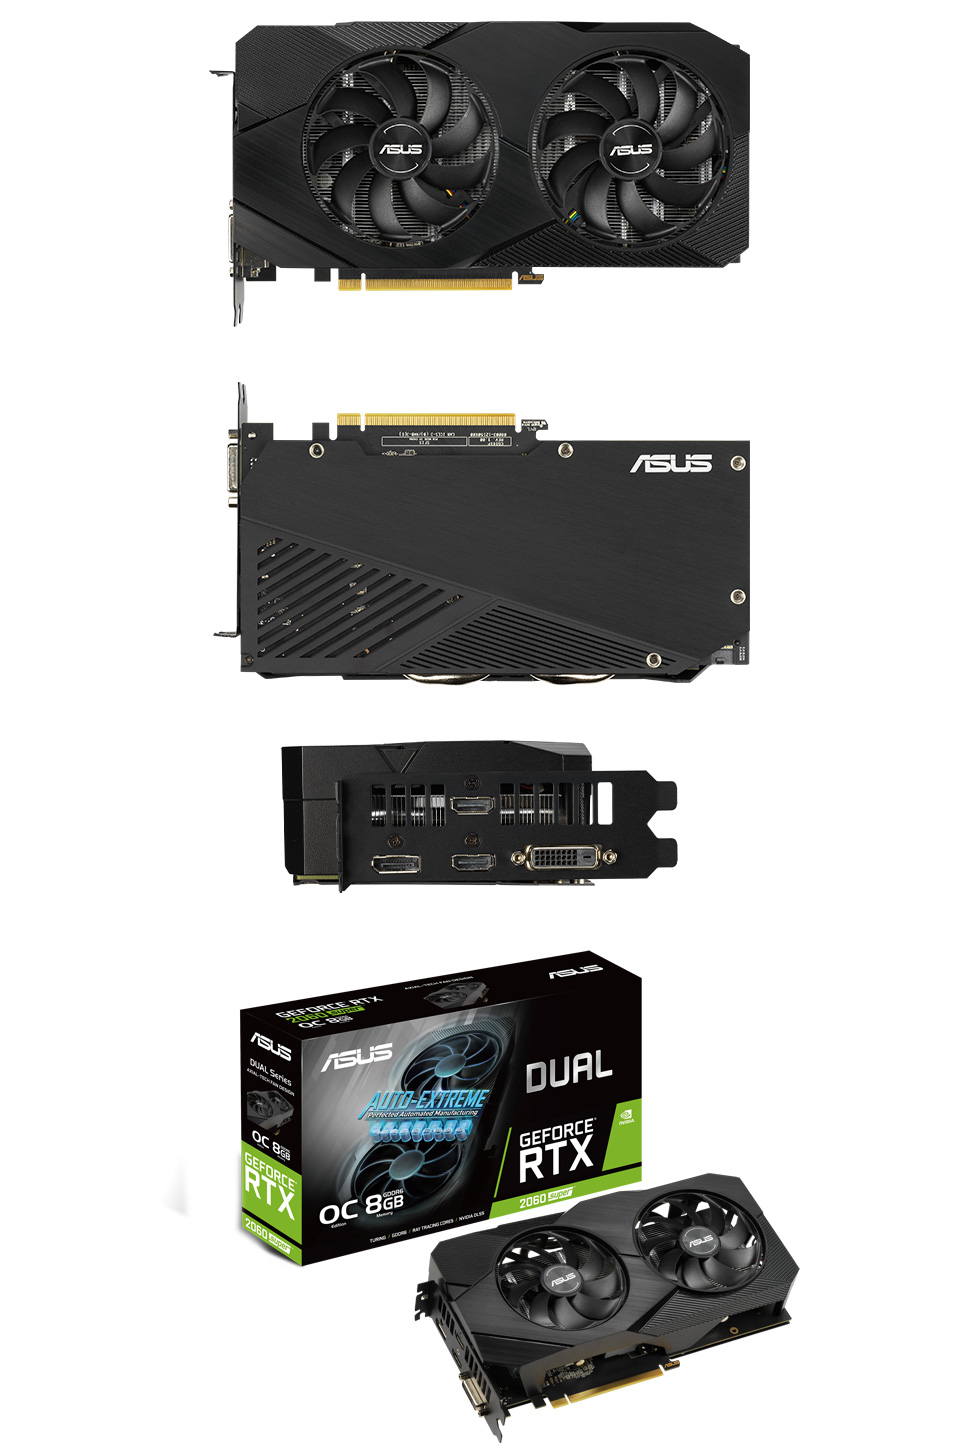 ASUS GeForce RTX 2060 Super Dual OC EVO 8GB V2 product